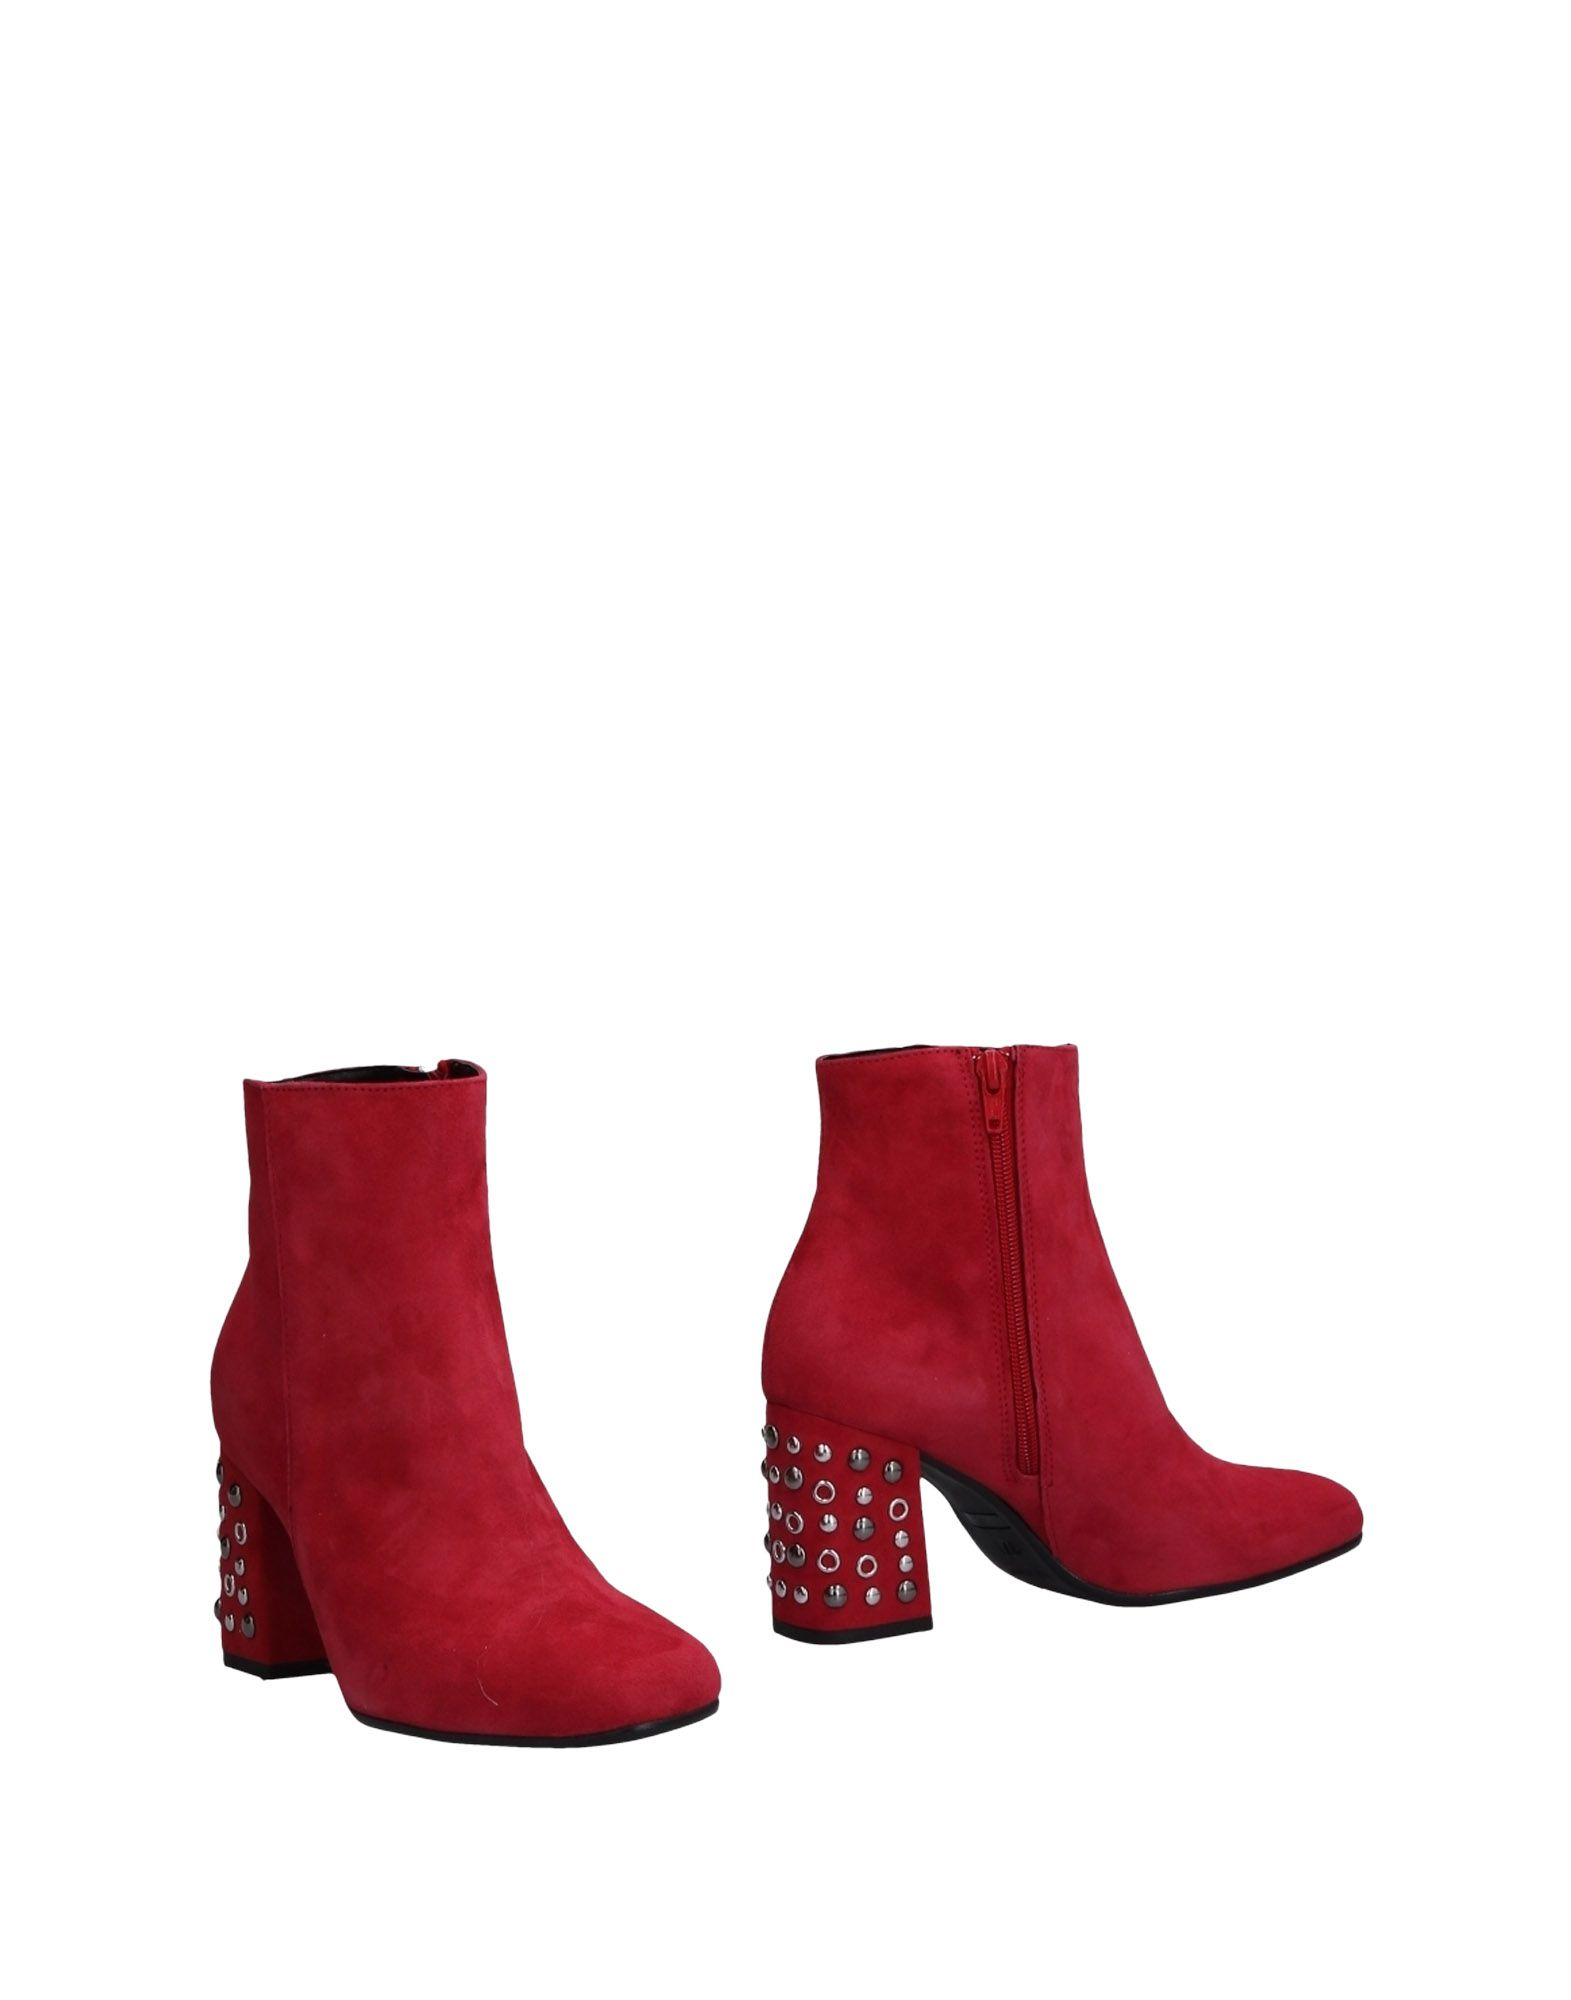 Nila & Nila Stiefelette Damen Neue  11473452AG Neue Damen Schuhe edf98e